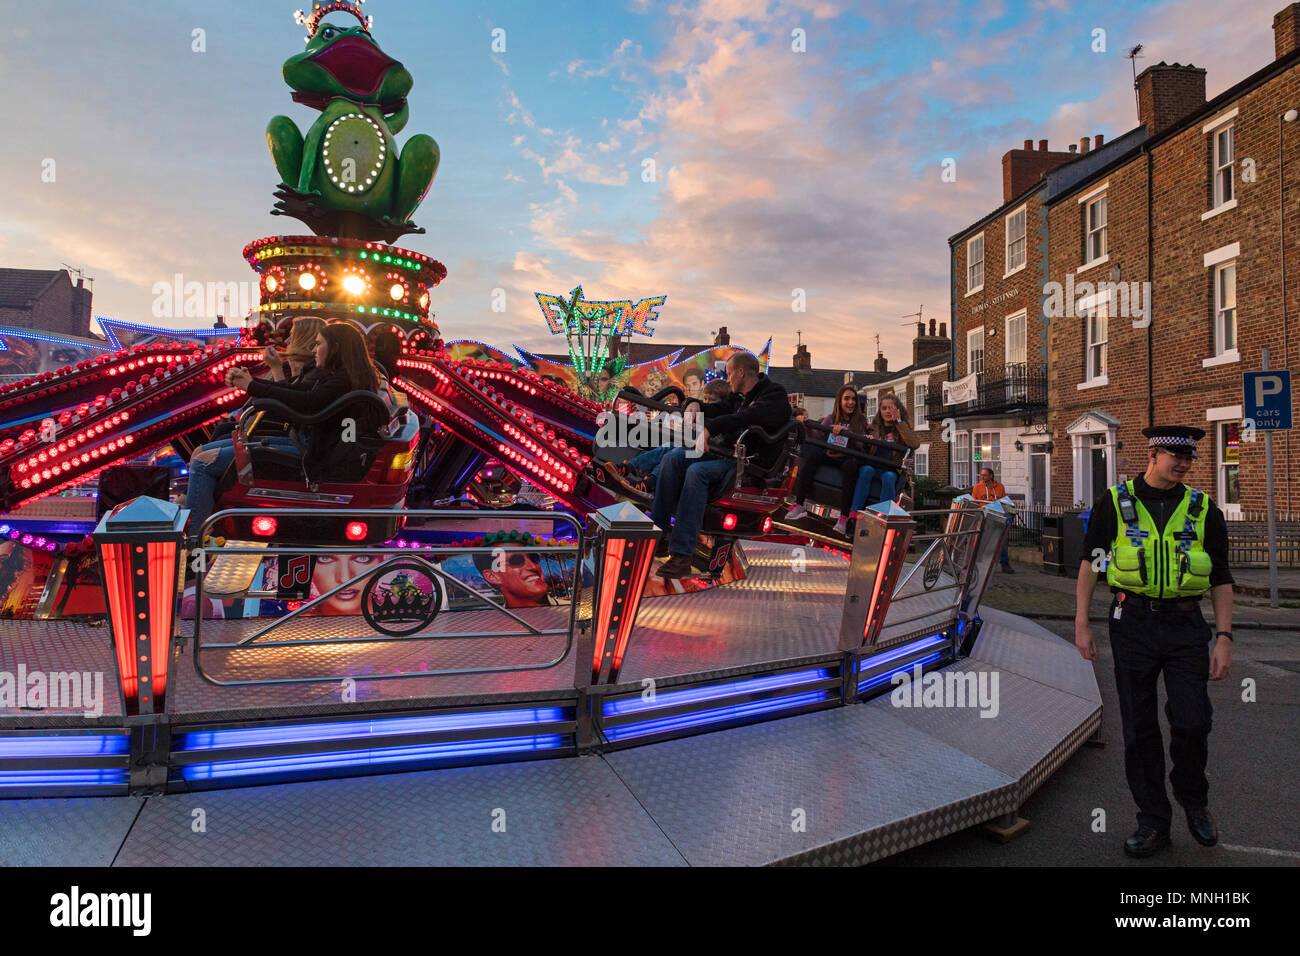 Stokesley Show, North Yorkshire, England, UK Stock Photo